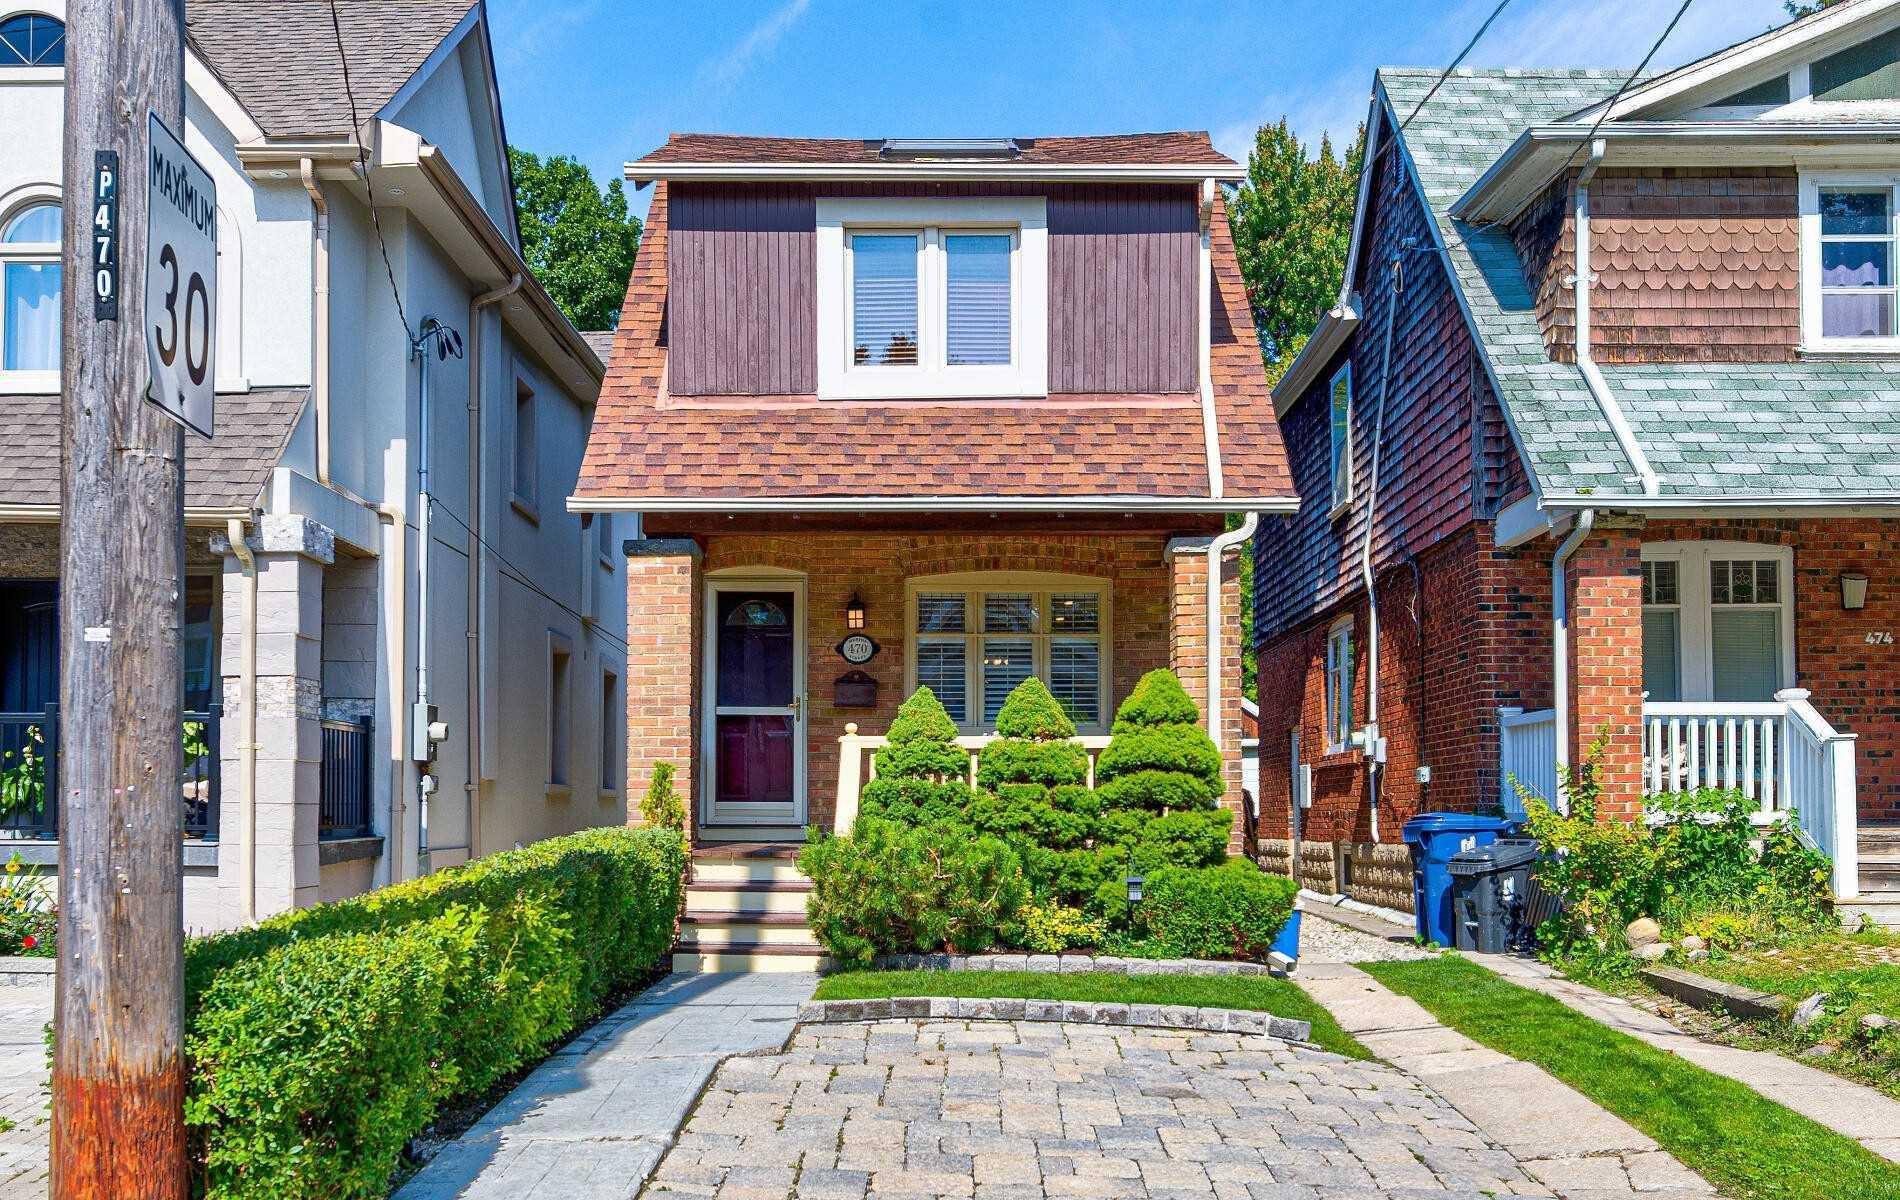 Main Photo: 470 Merton Street in Toronto: Mount Pleasant East House (2-Storey) for sale (Toronto C10)  : MLS®# C4583993